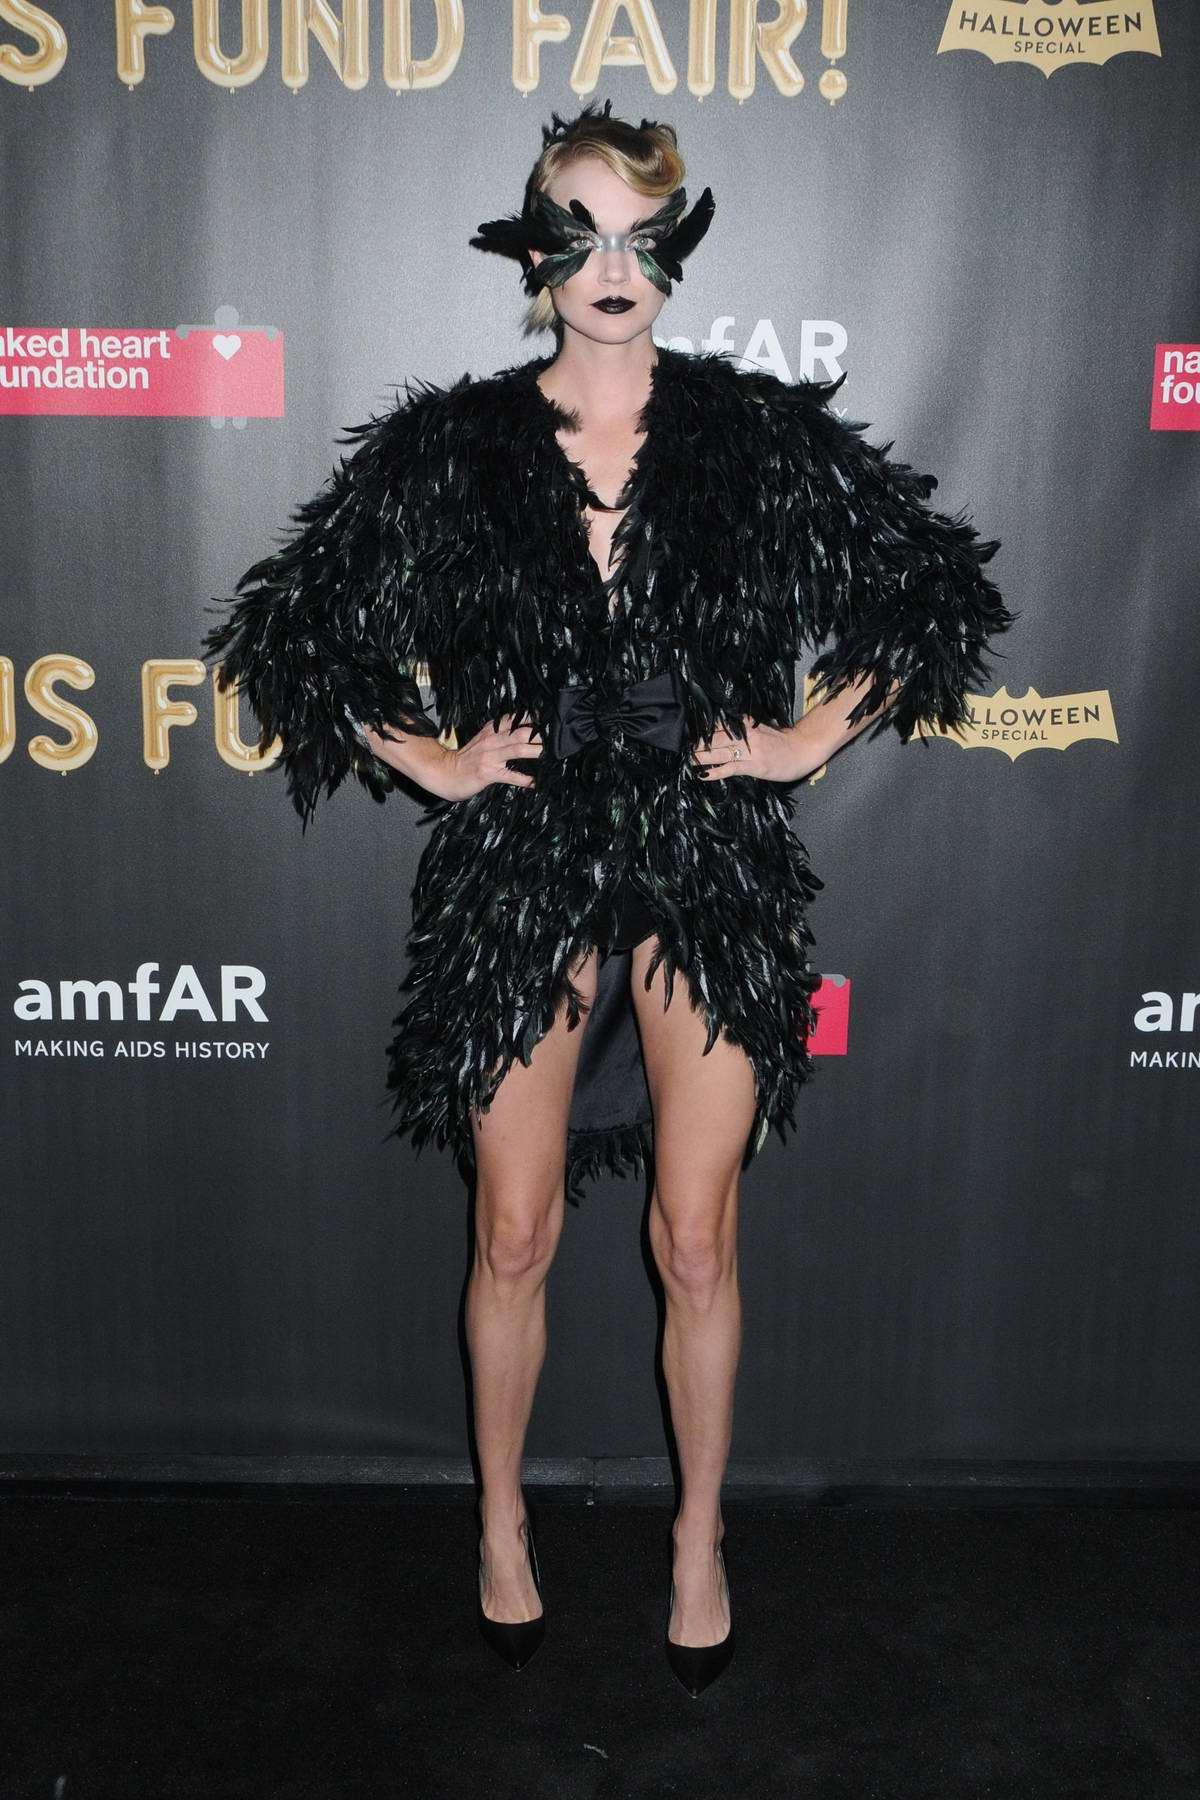 Lindsay Ellingson at the 2017 amfAR Fabulous Fund Fair at Skylight Clarkson SQ in New York City